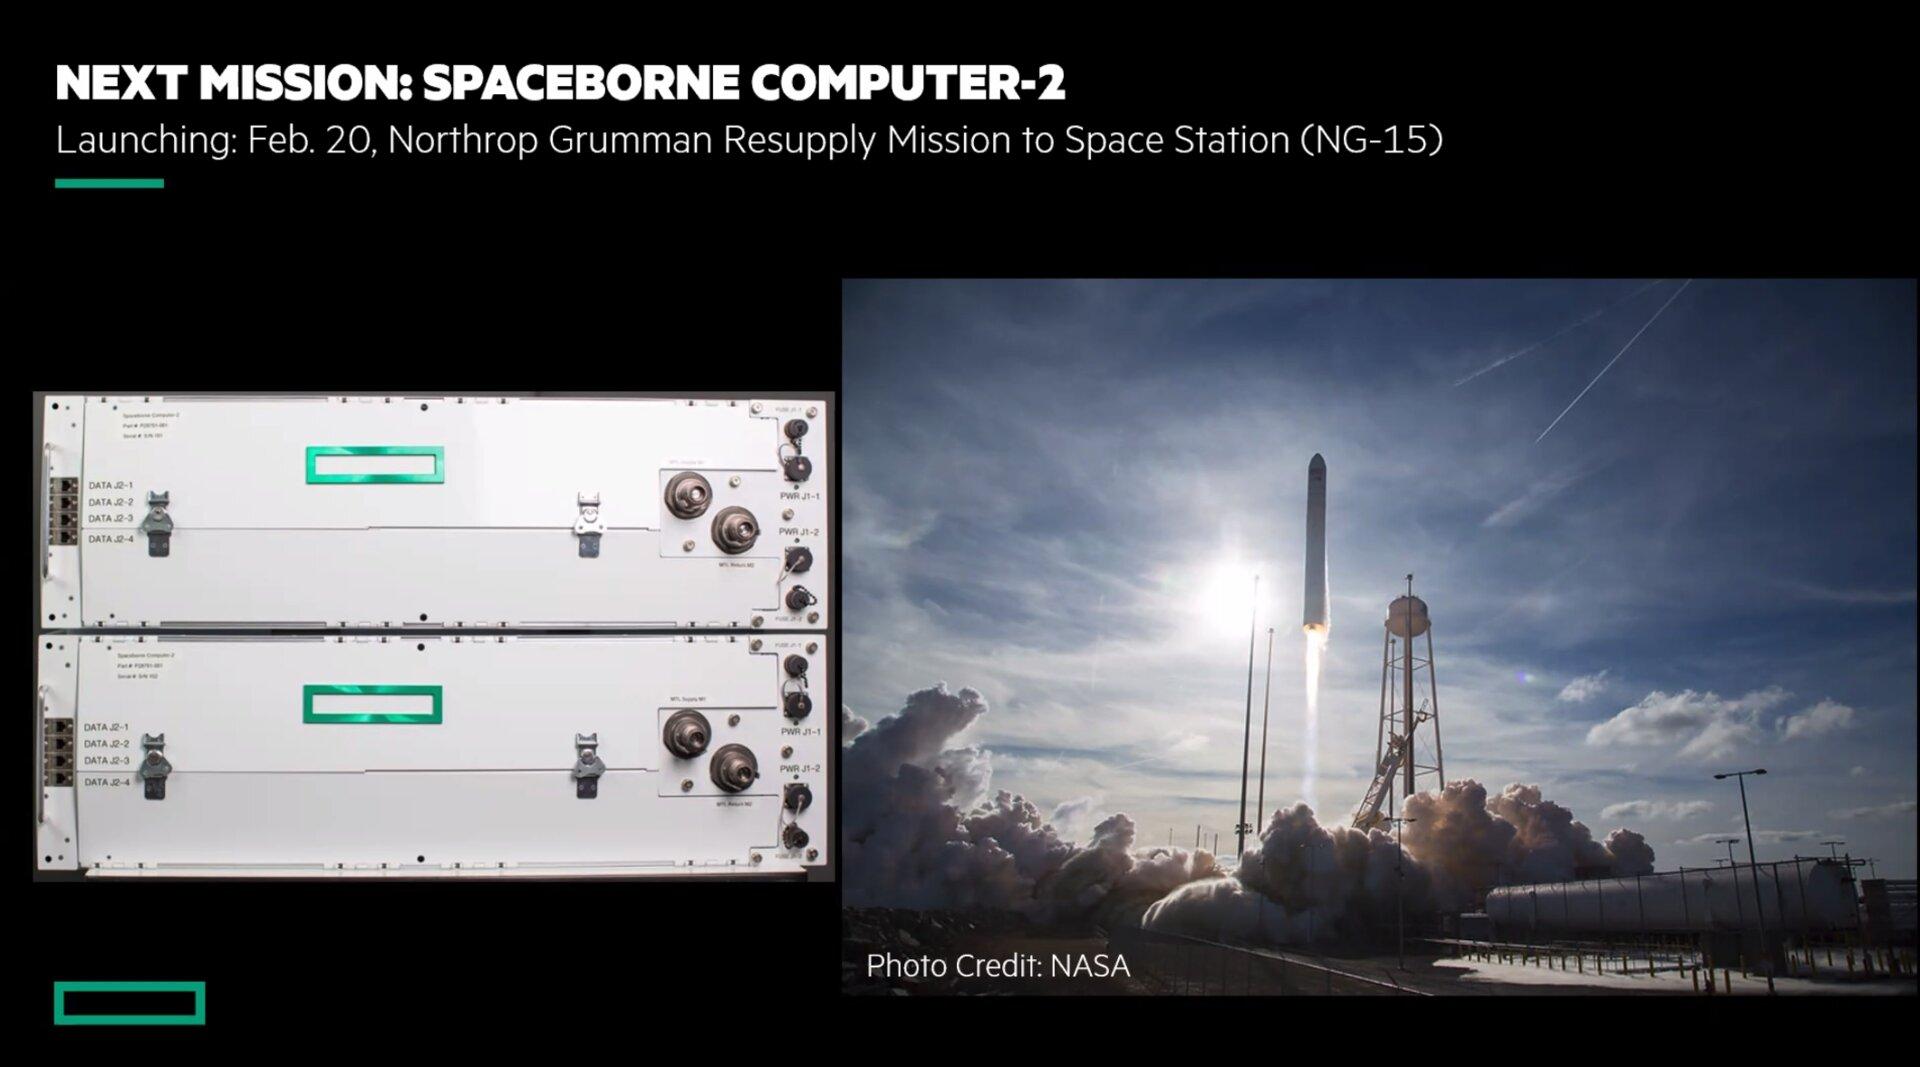 HPE Spaceborne 2 startet am 20. Februar